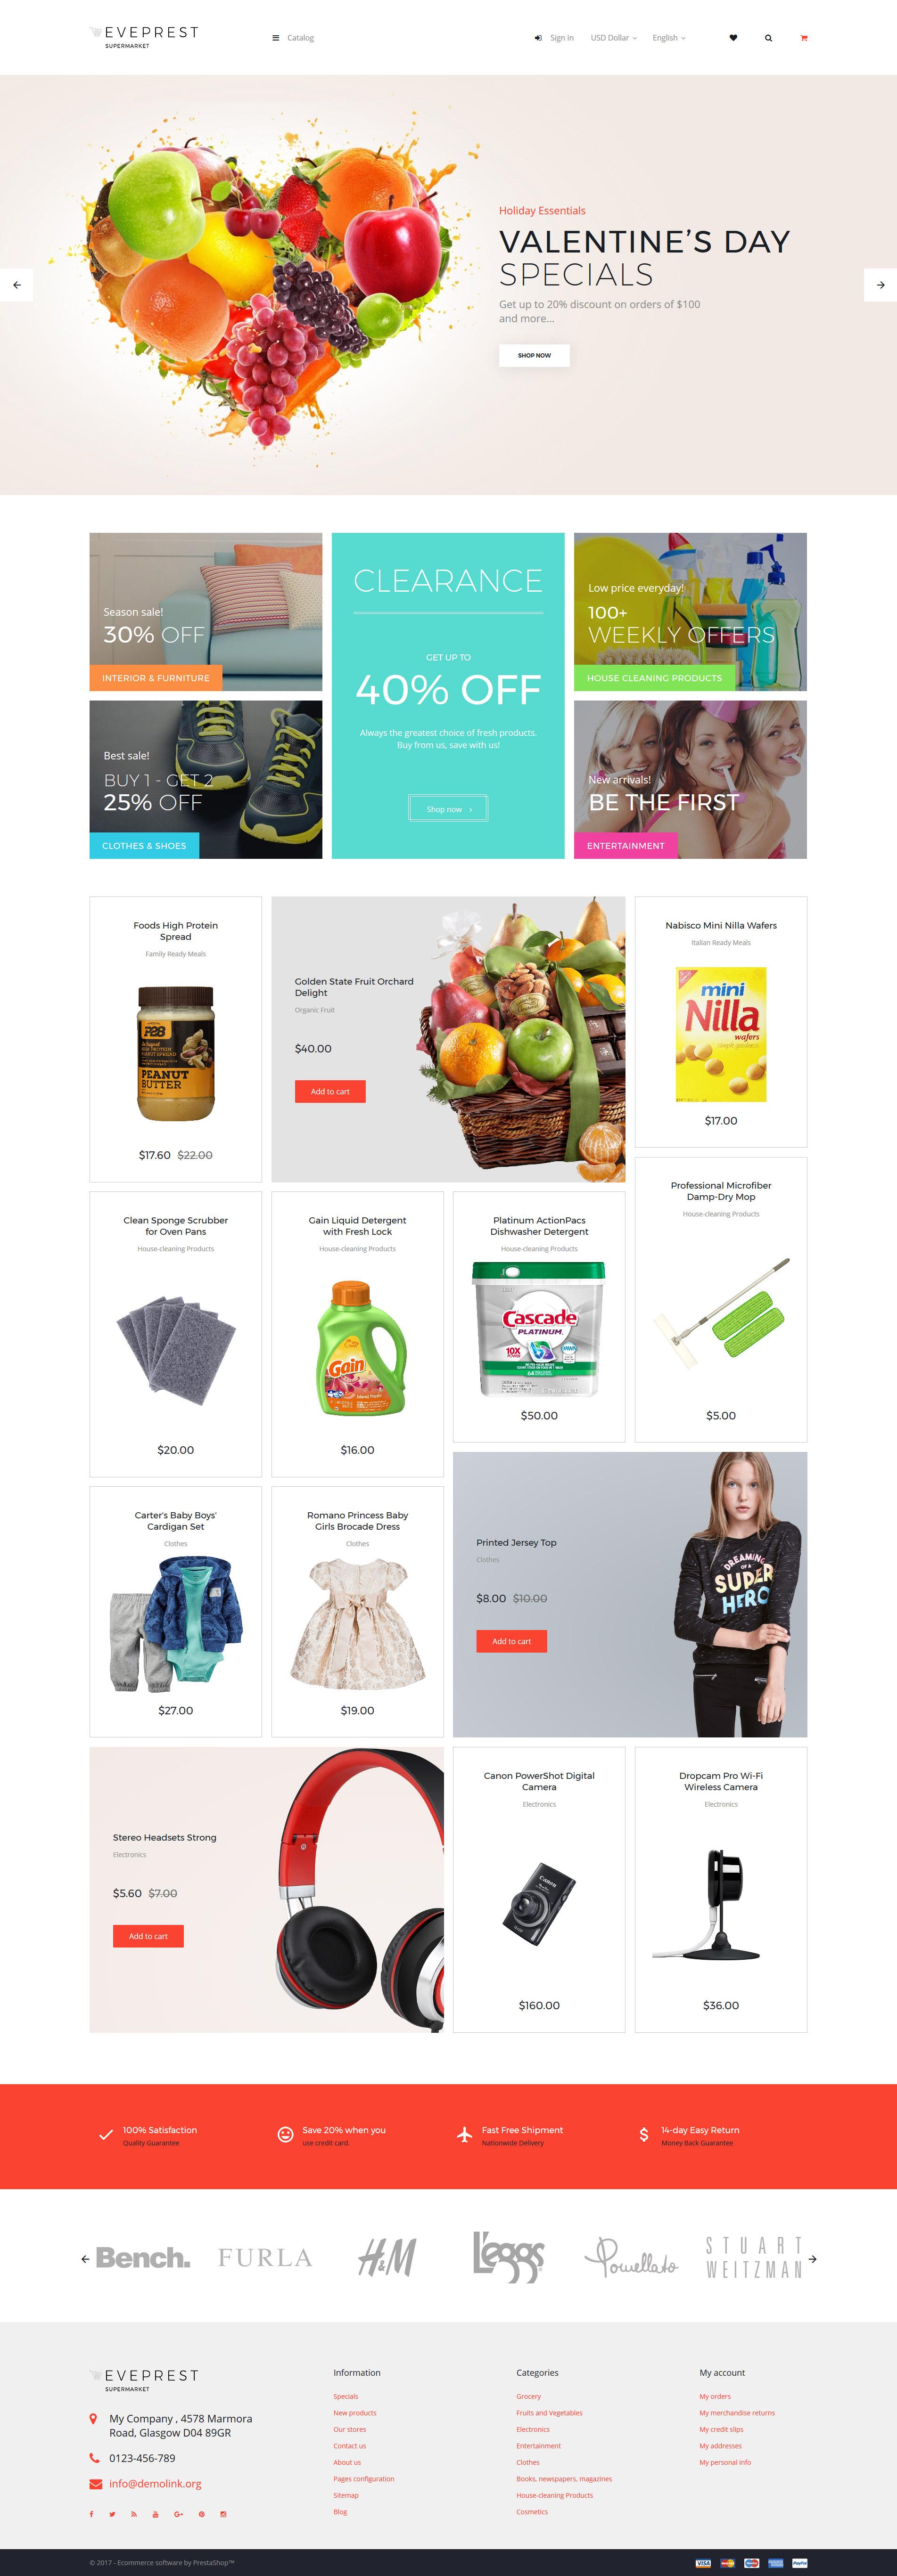 Responsywny szablon PrestaShop Eveprest - Supermarket #62387 - zrzut ekranu